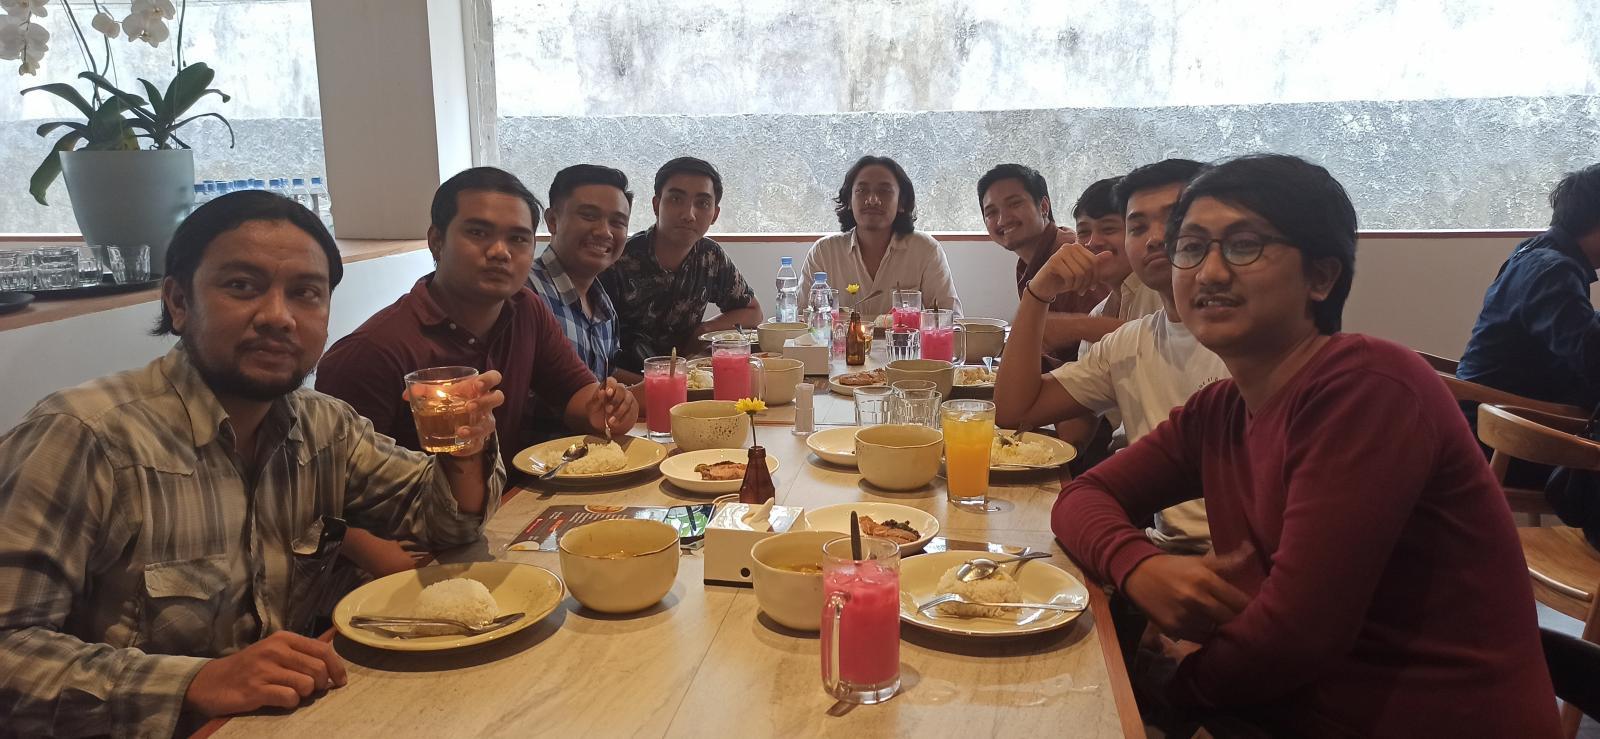 Gathering Event with Emporio Architect Bali Team at IGOR Renon 2